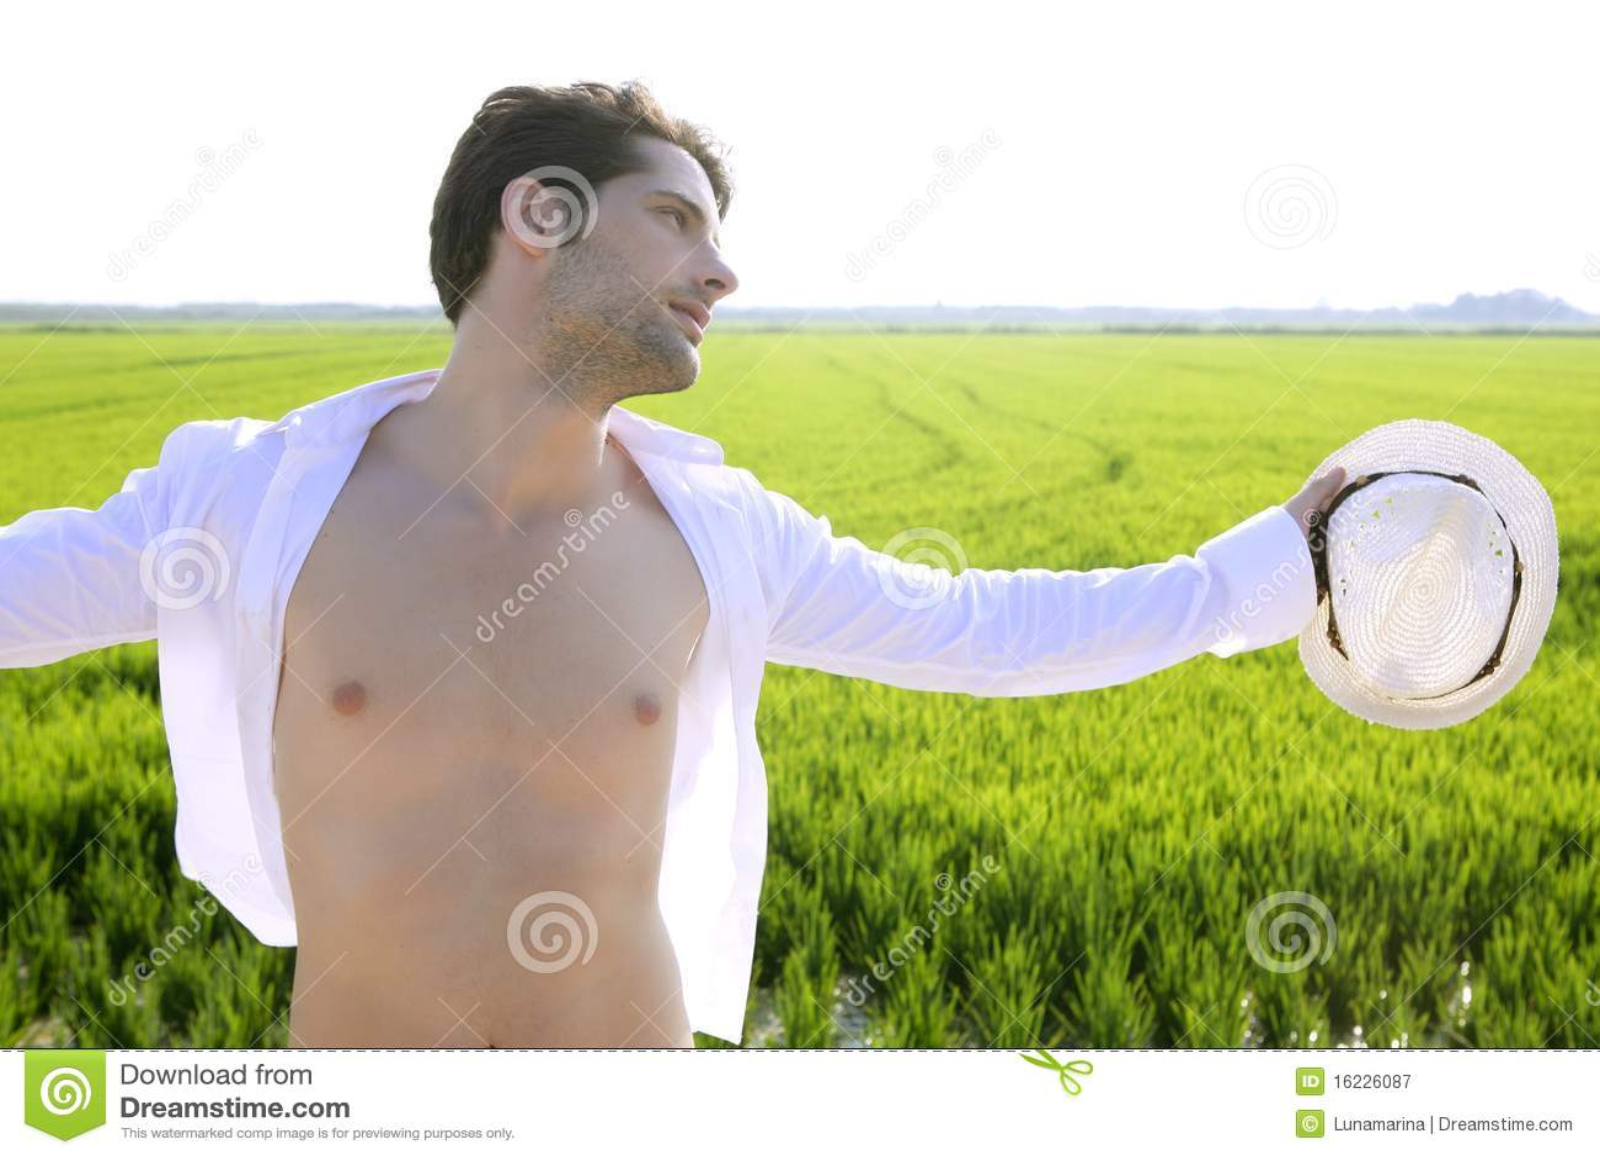 Summer Man Open Shirt Outdoor Meadow Stock Image Image